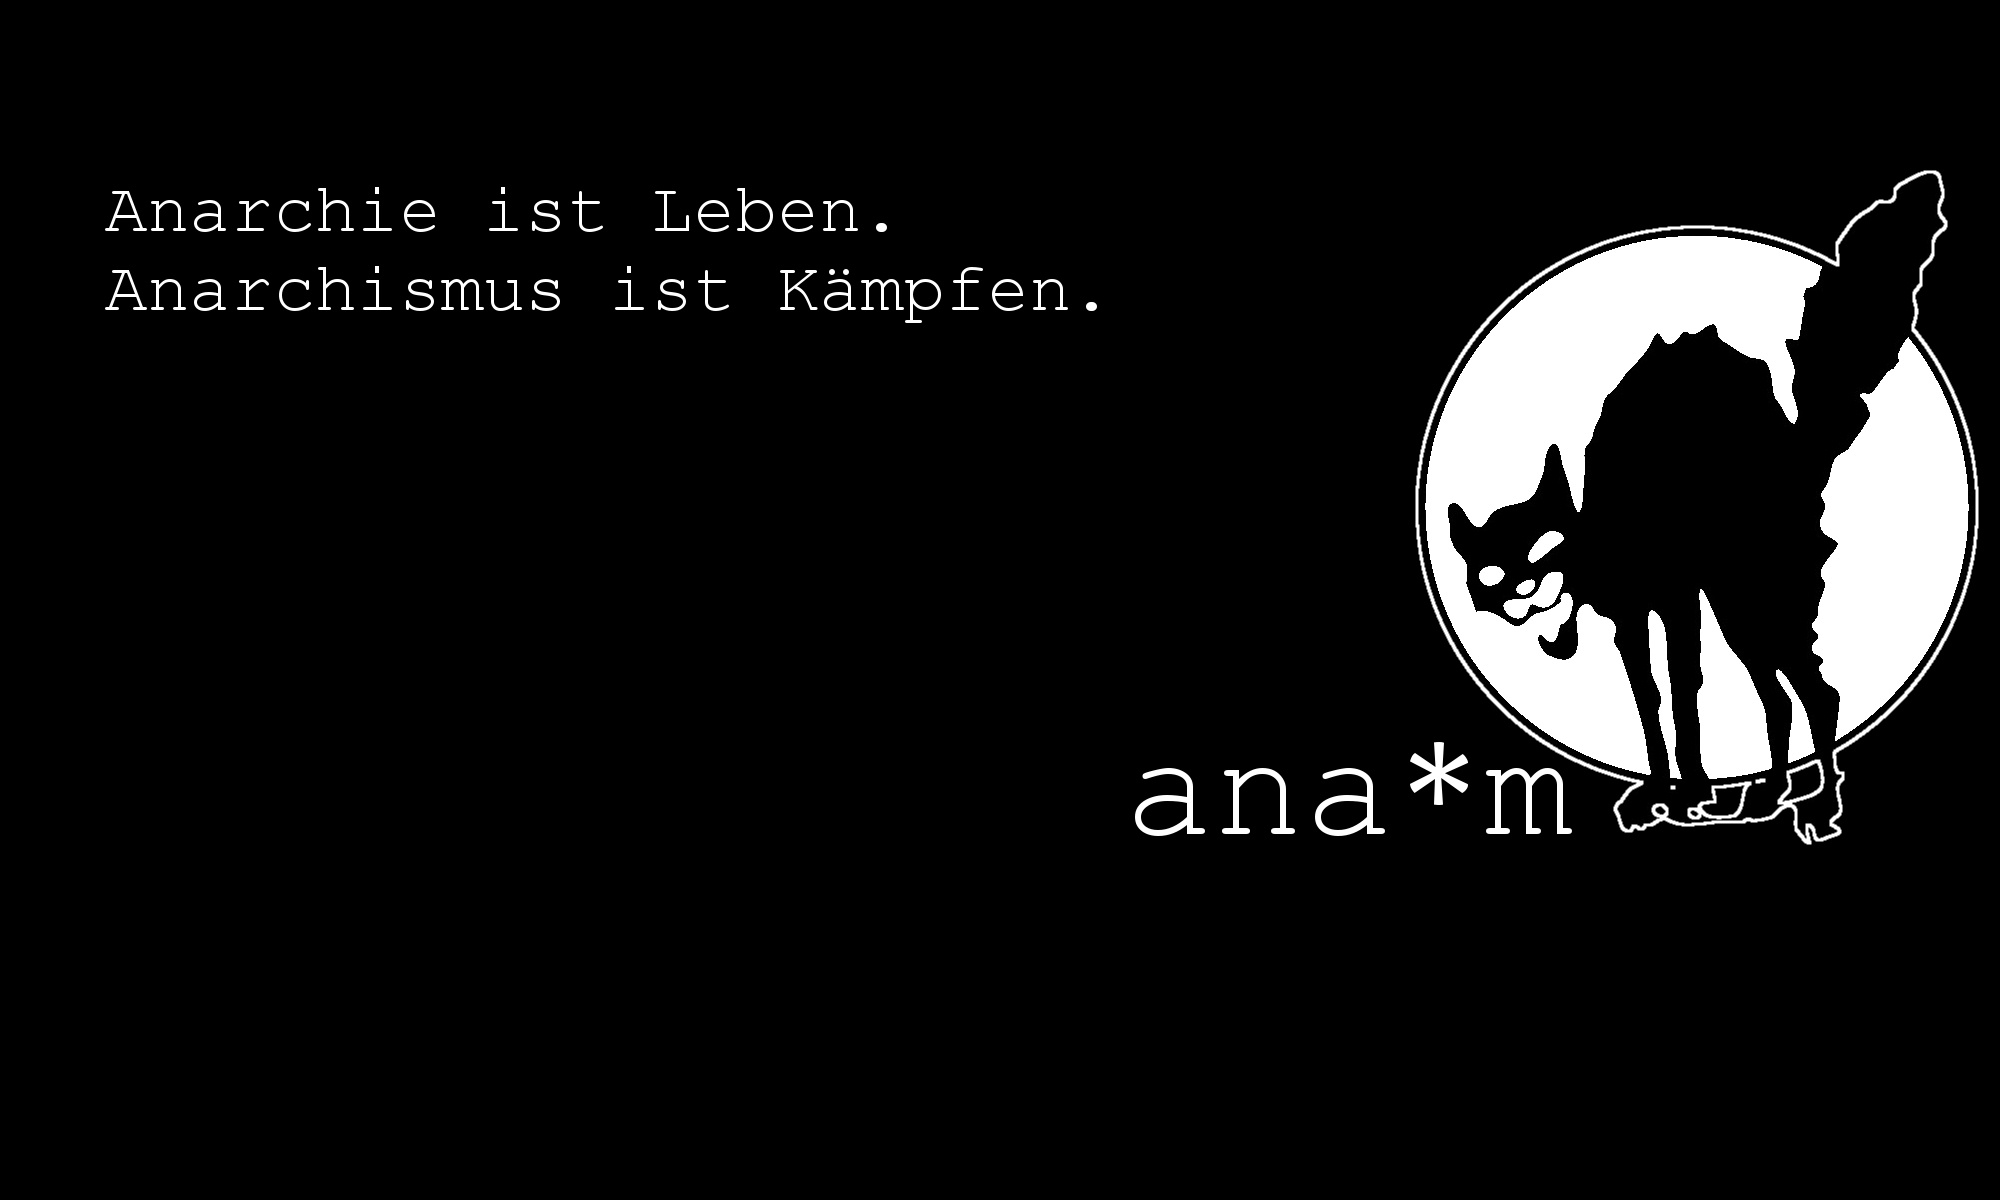 ana*m